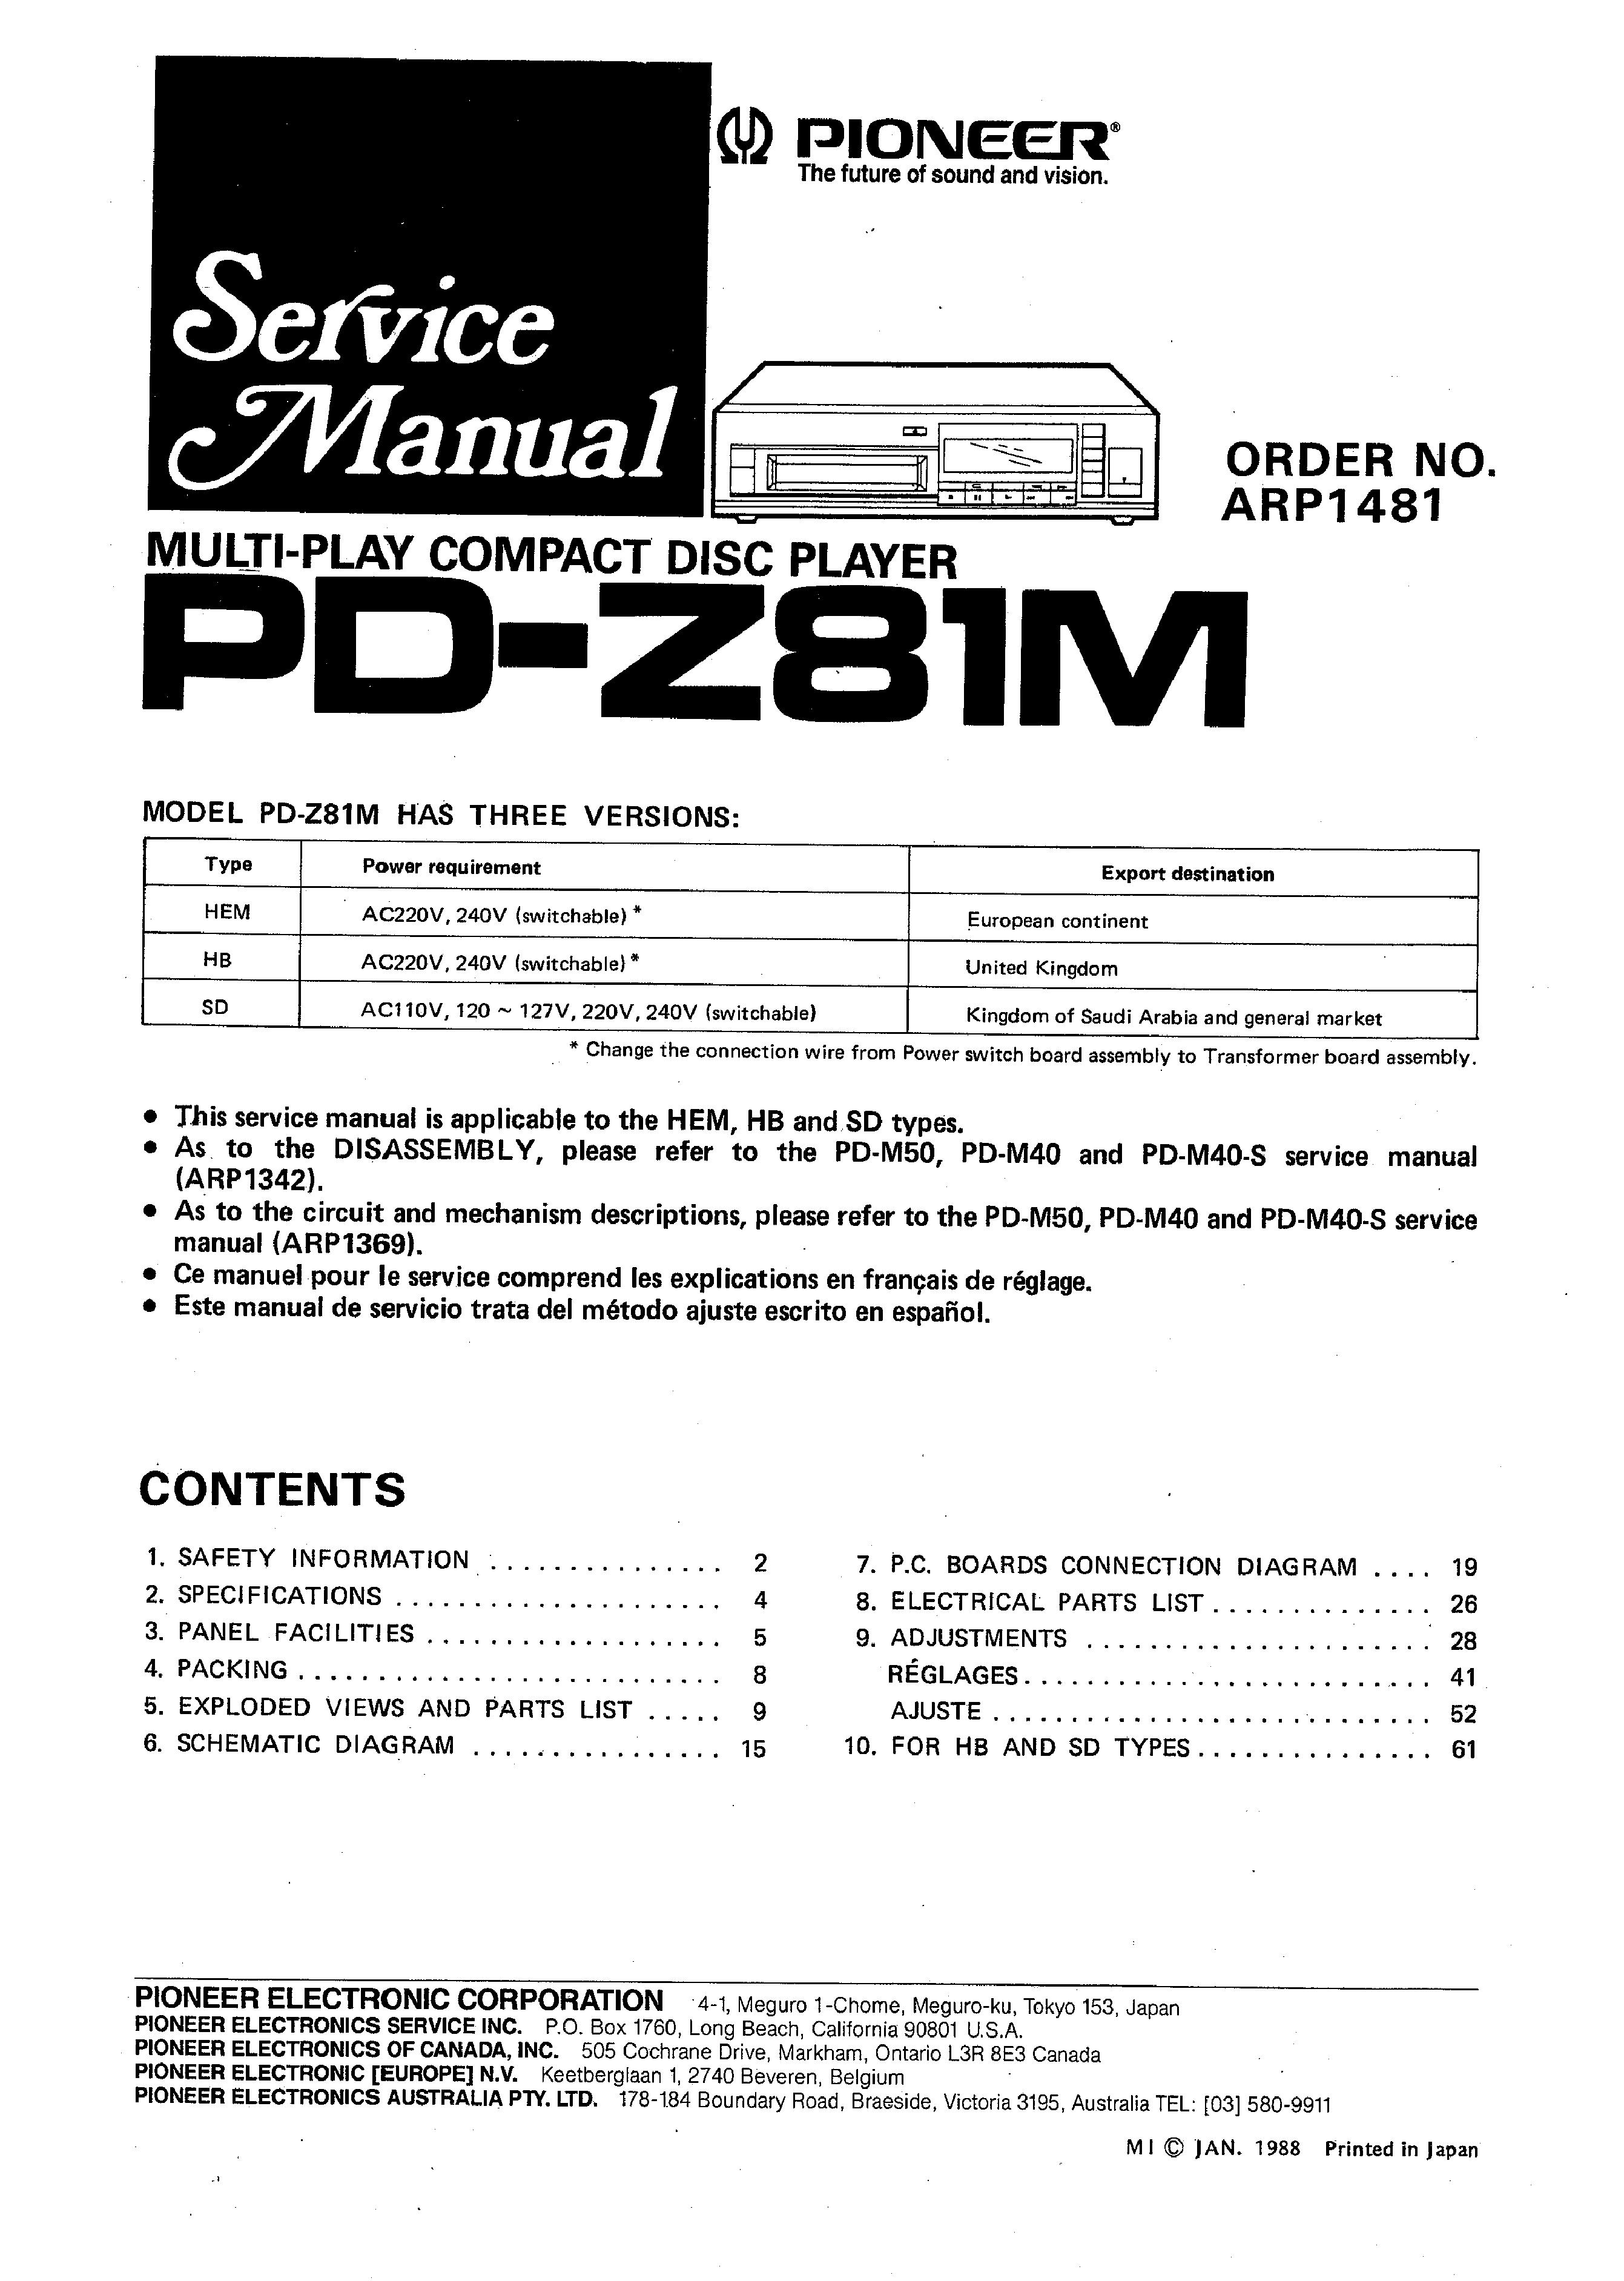 PIONEER PRO98 - Service Manual Immediate Download